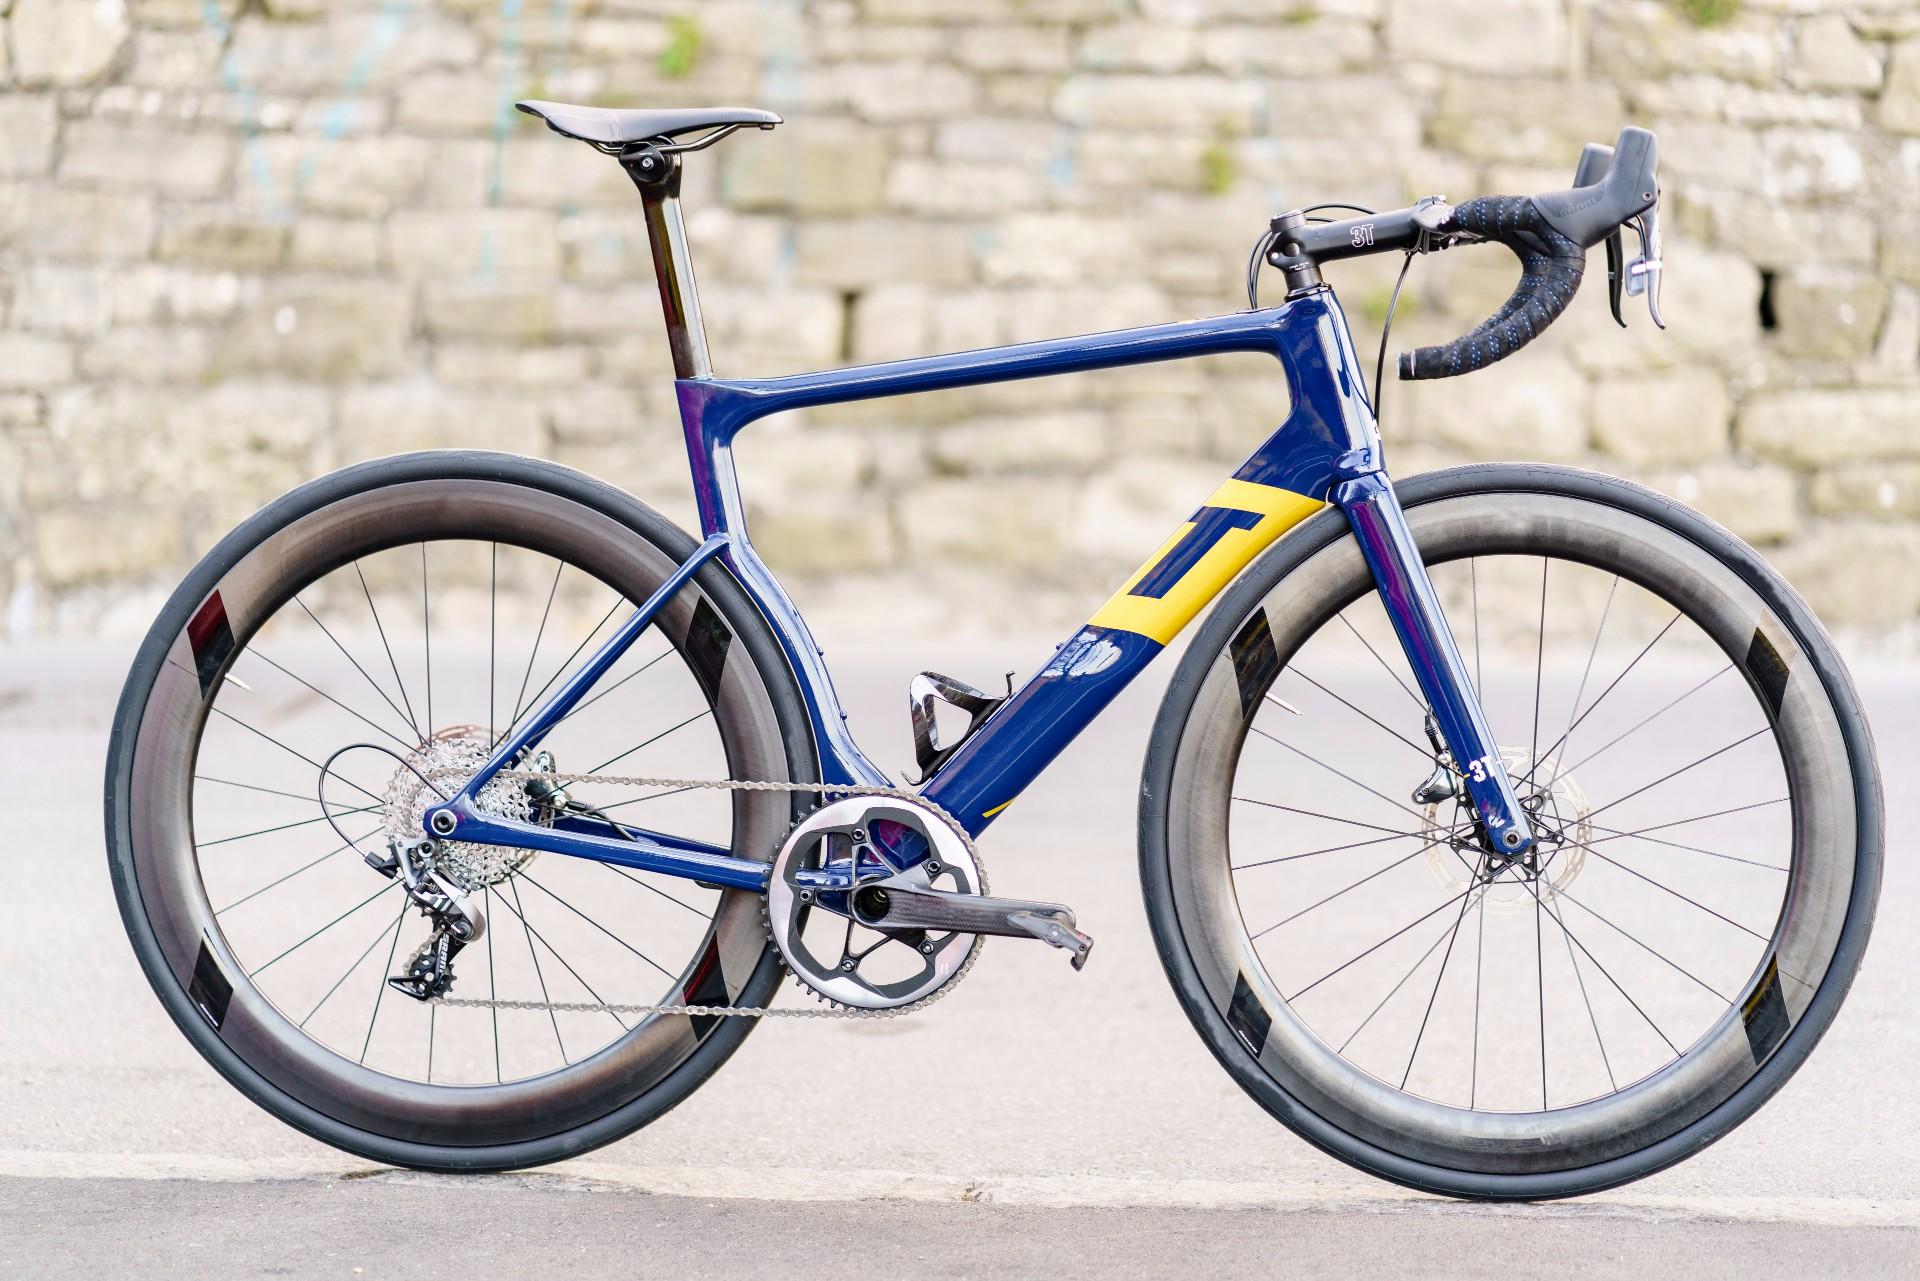 Sepeda Balap dengan single chainring Aqua Blue Sport's new 3T Strada team